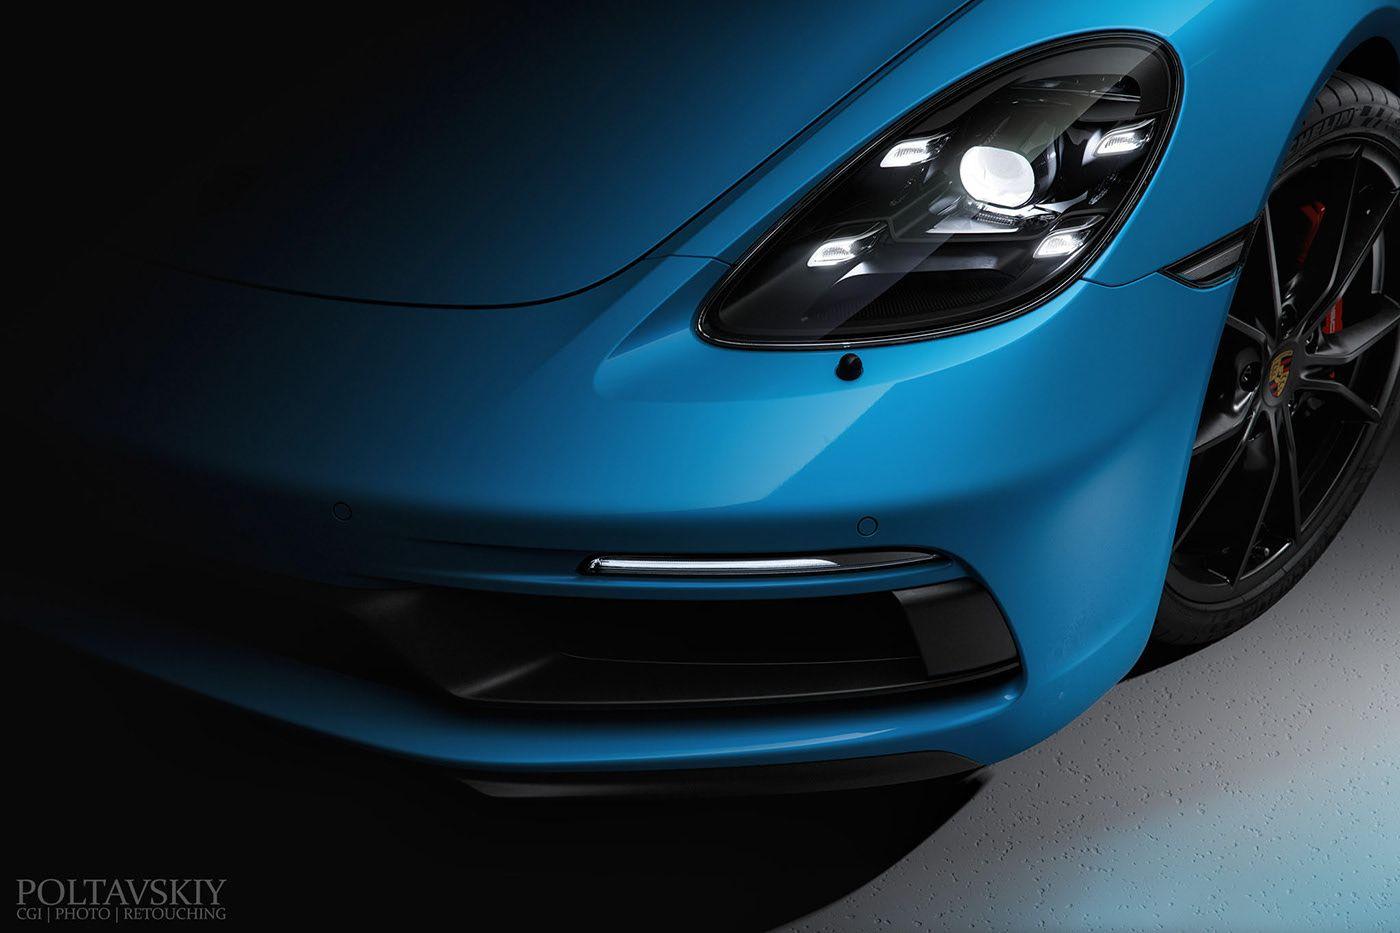 Behance 为您呈现 in 2020 Digital art photography, Porsche